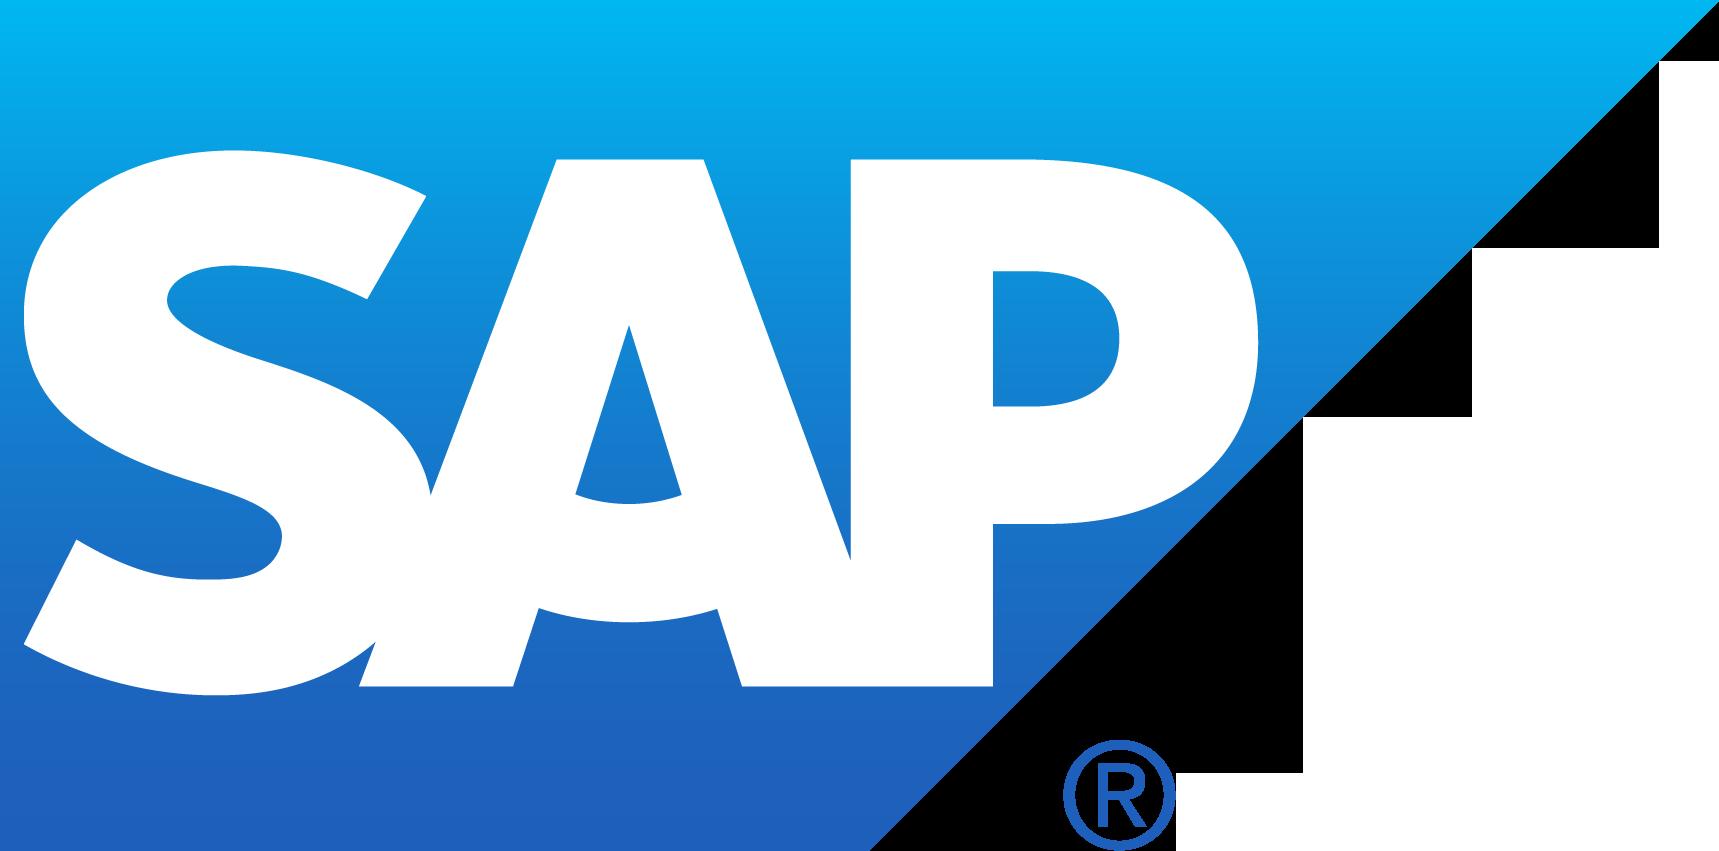 SAP-Logo-transparent-bkgrd1.png